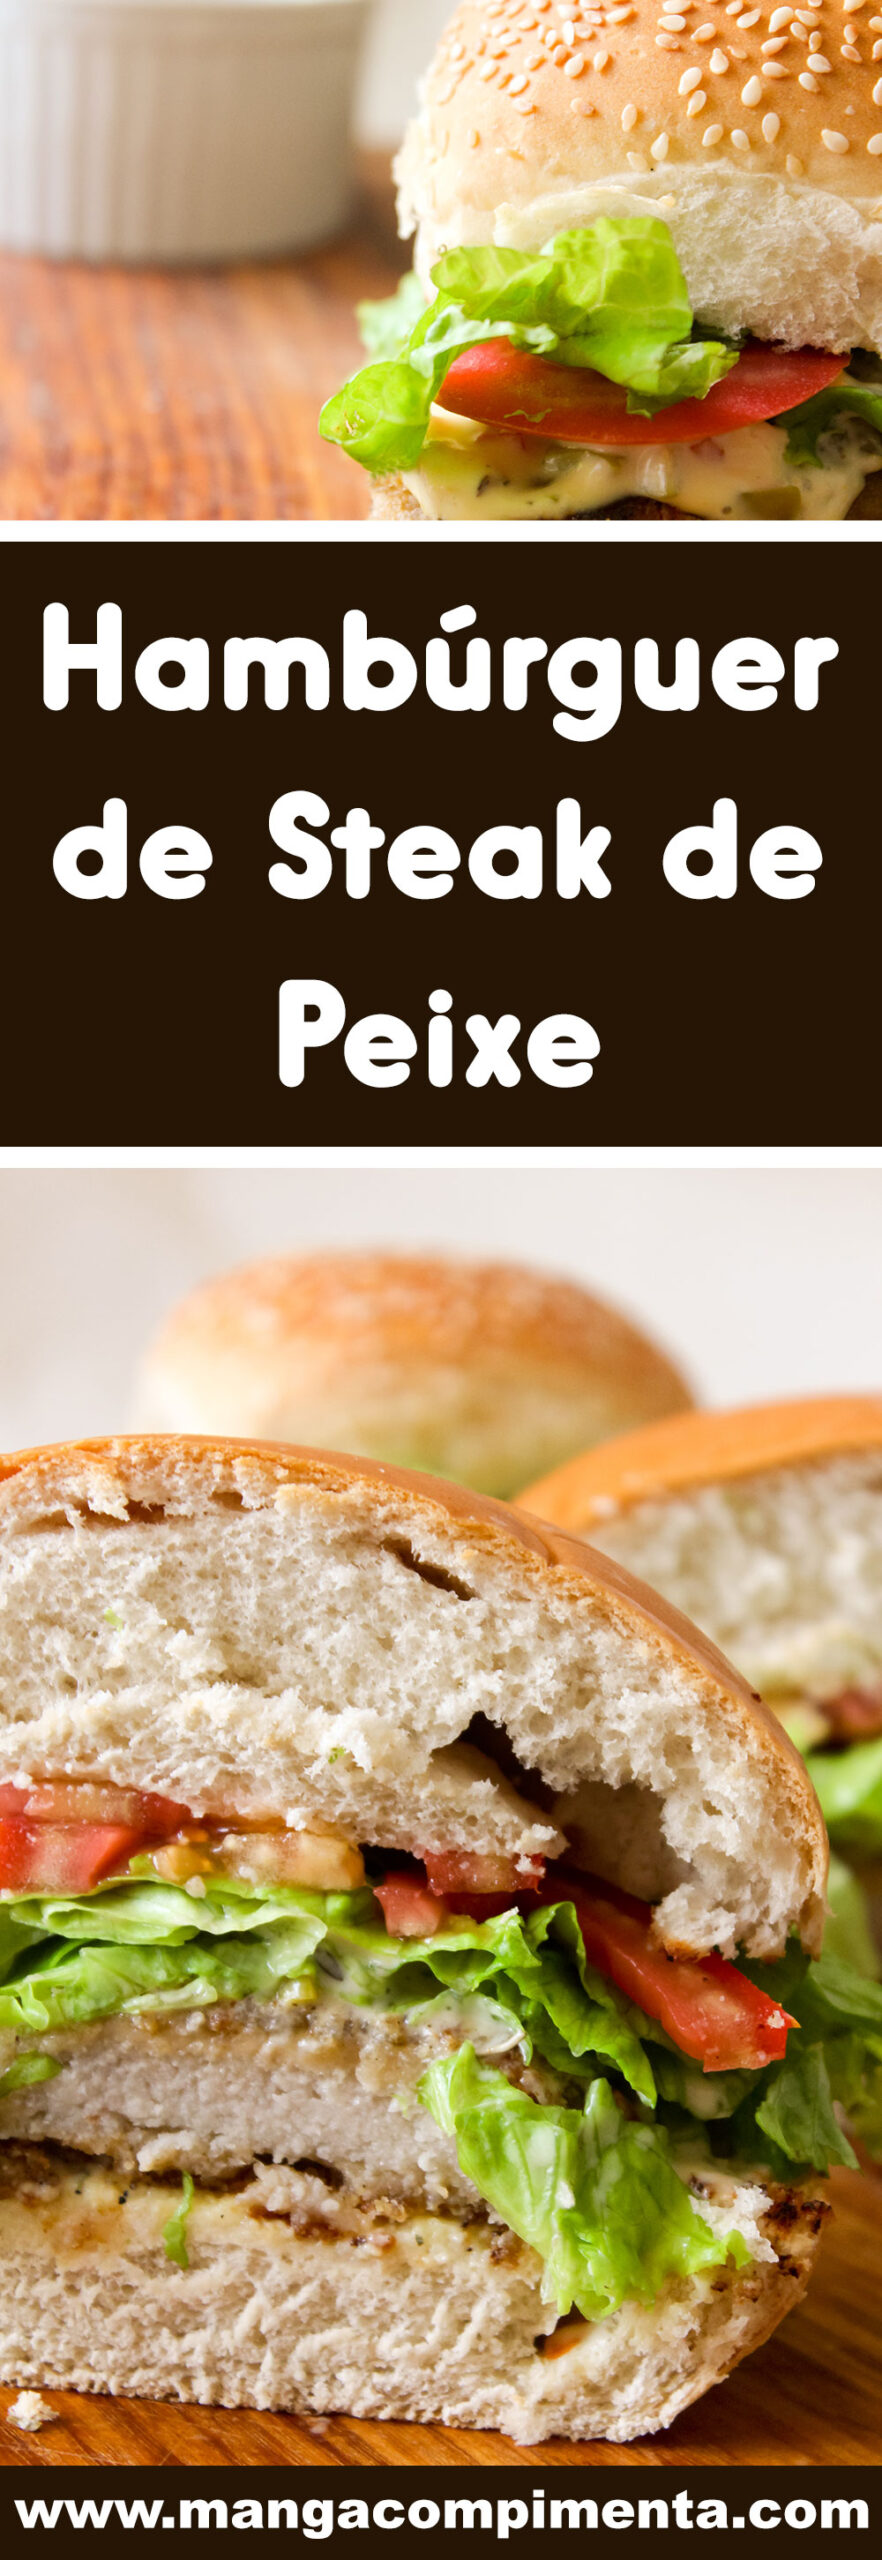 Receita de Hambúrguer de Steak de Peixe - um lanche fácil e rápido para preparar no final de semana.